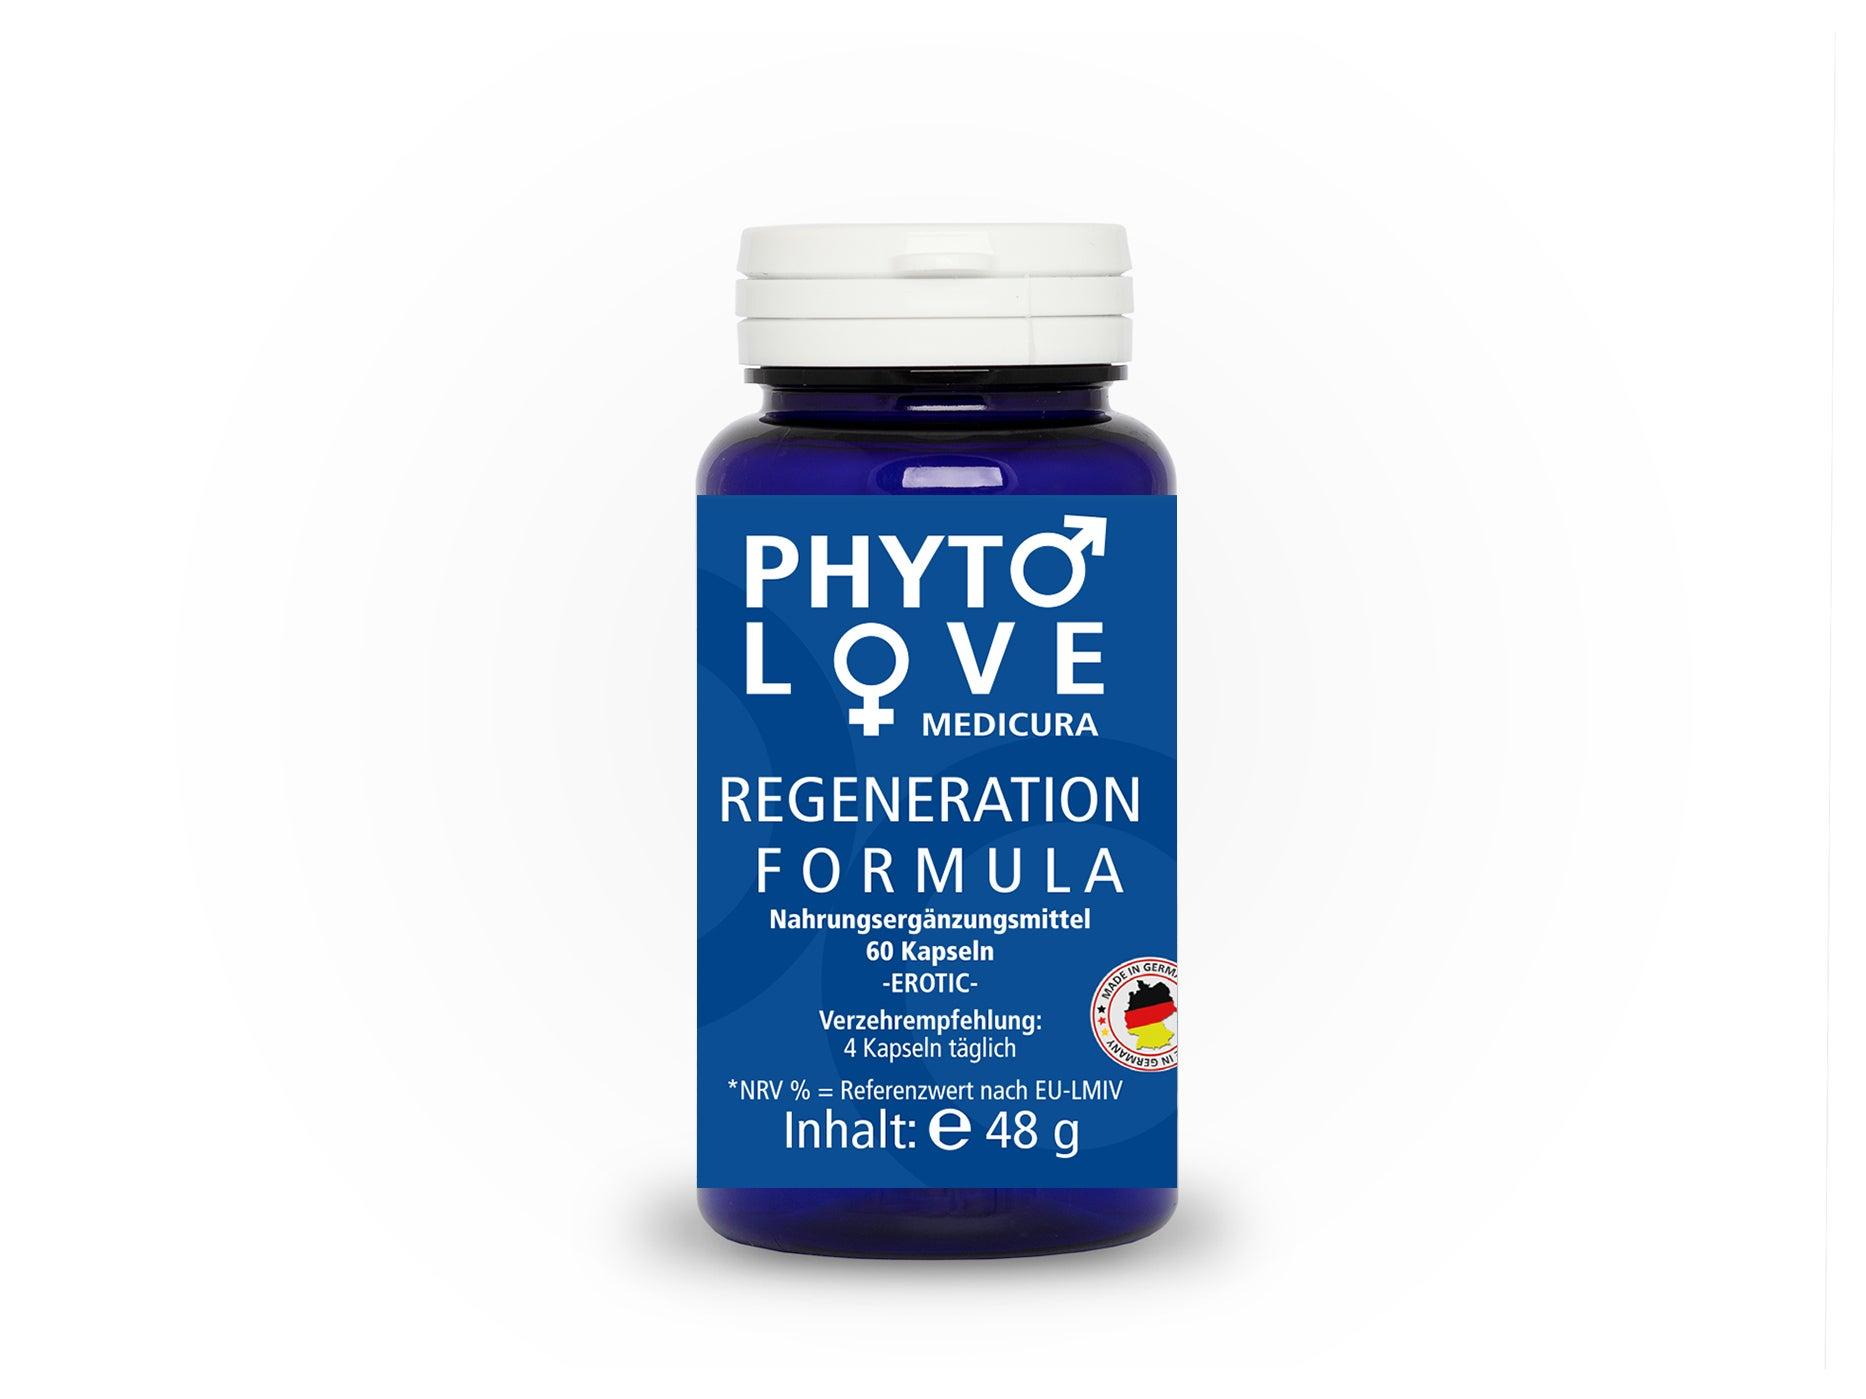 Phyto Love - Regeneration Formula - 60 Kapseln